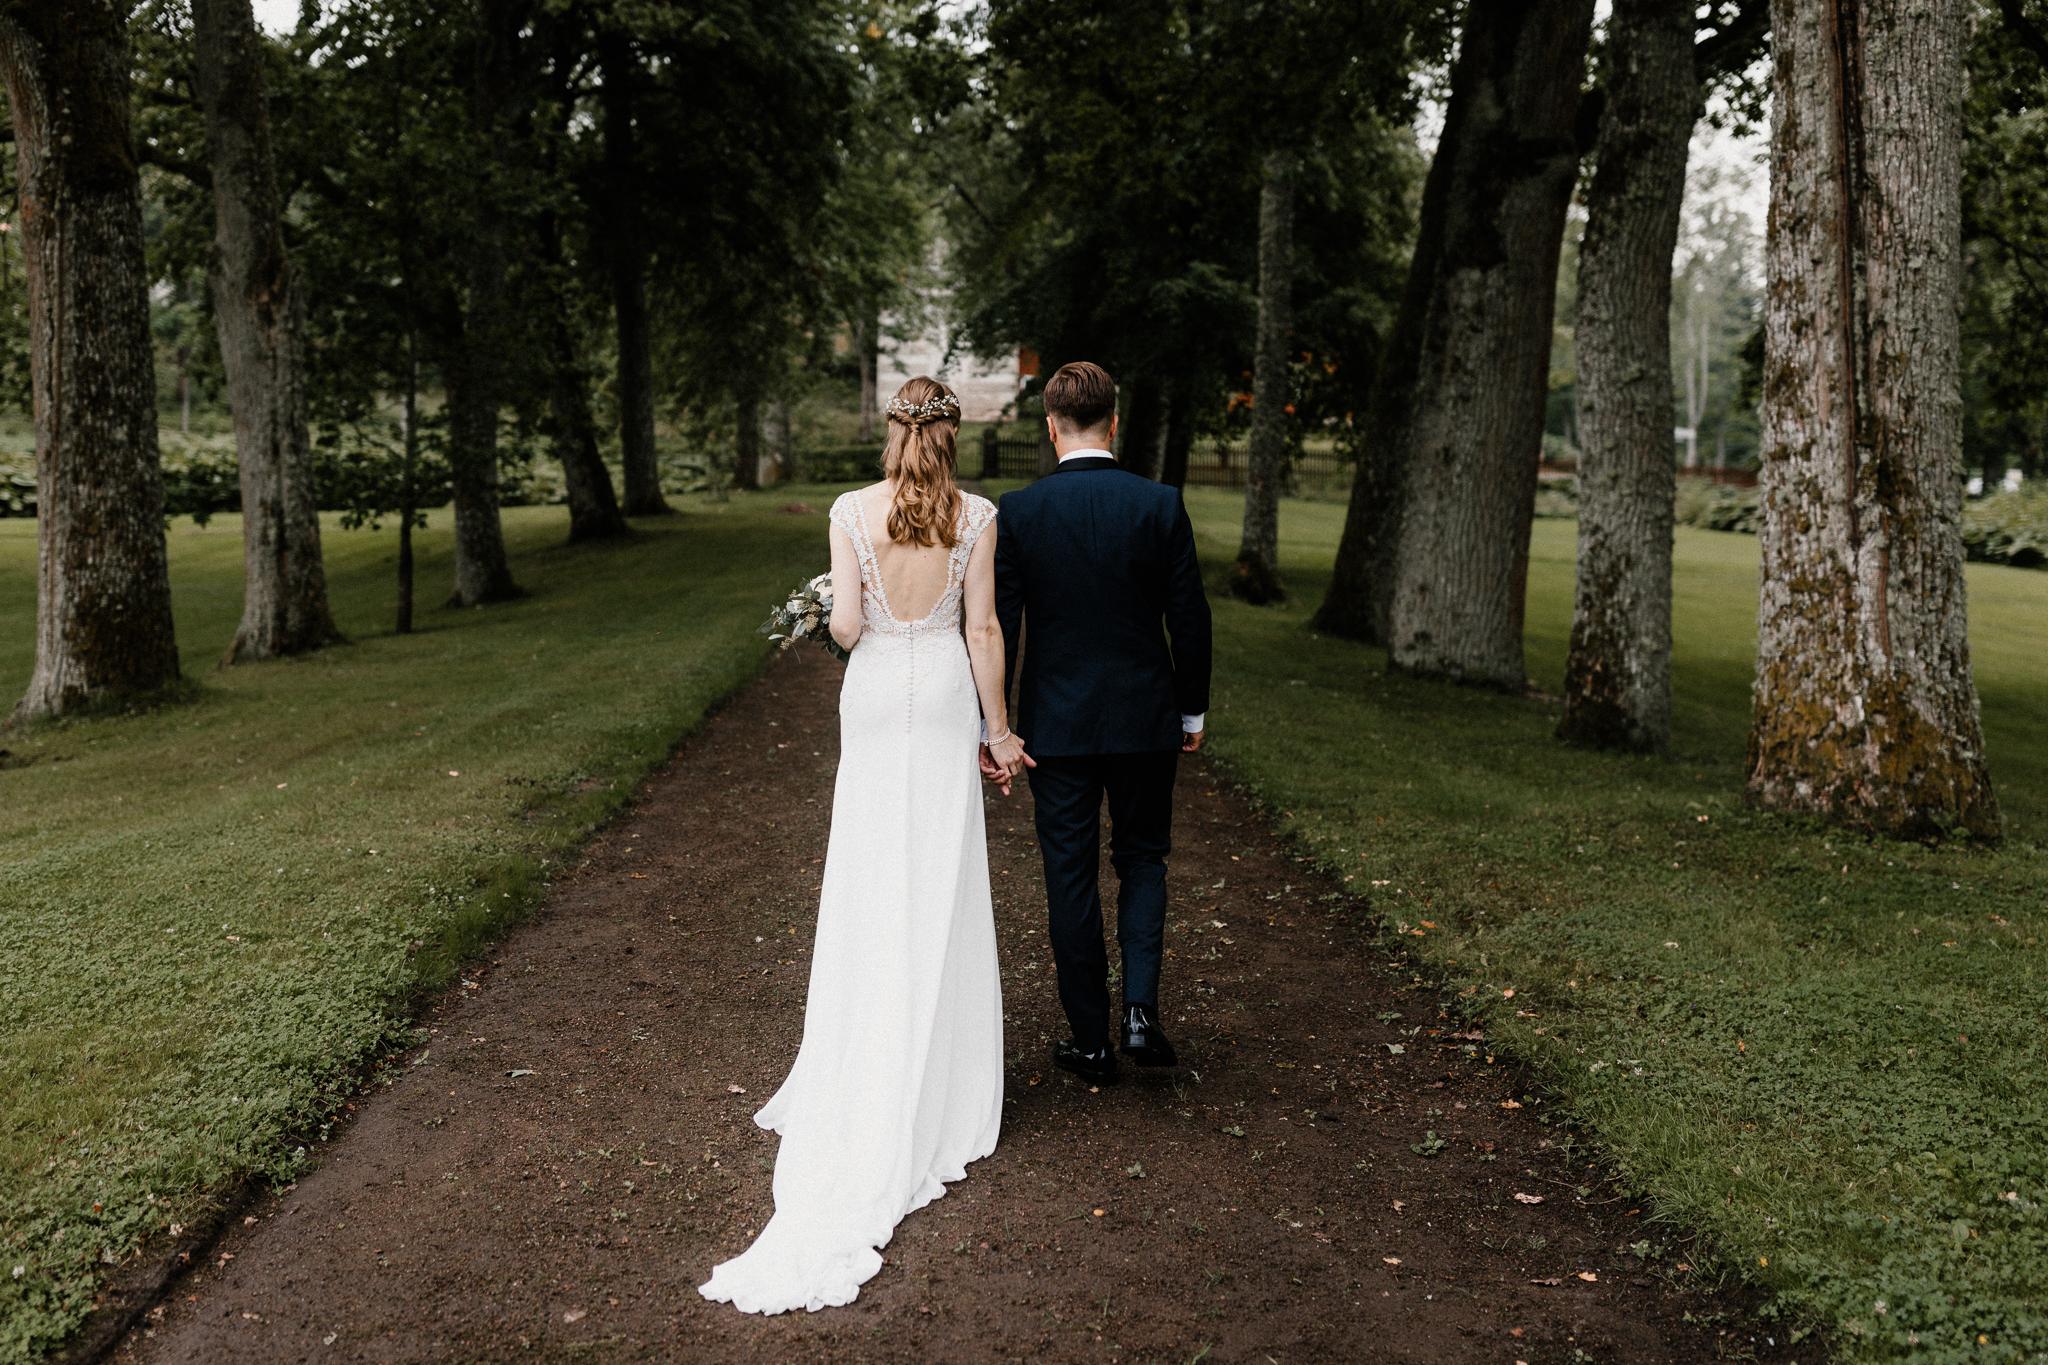 Jessica + Patrick | Fagervik | by Patrick Karkkolainen Wedding Photography-29.jpg